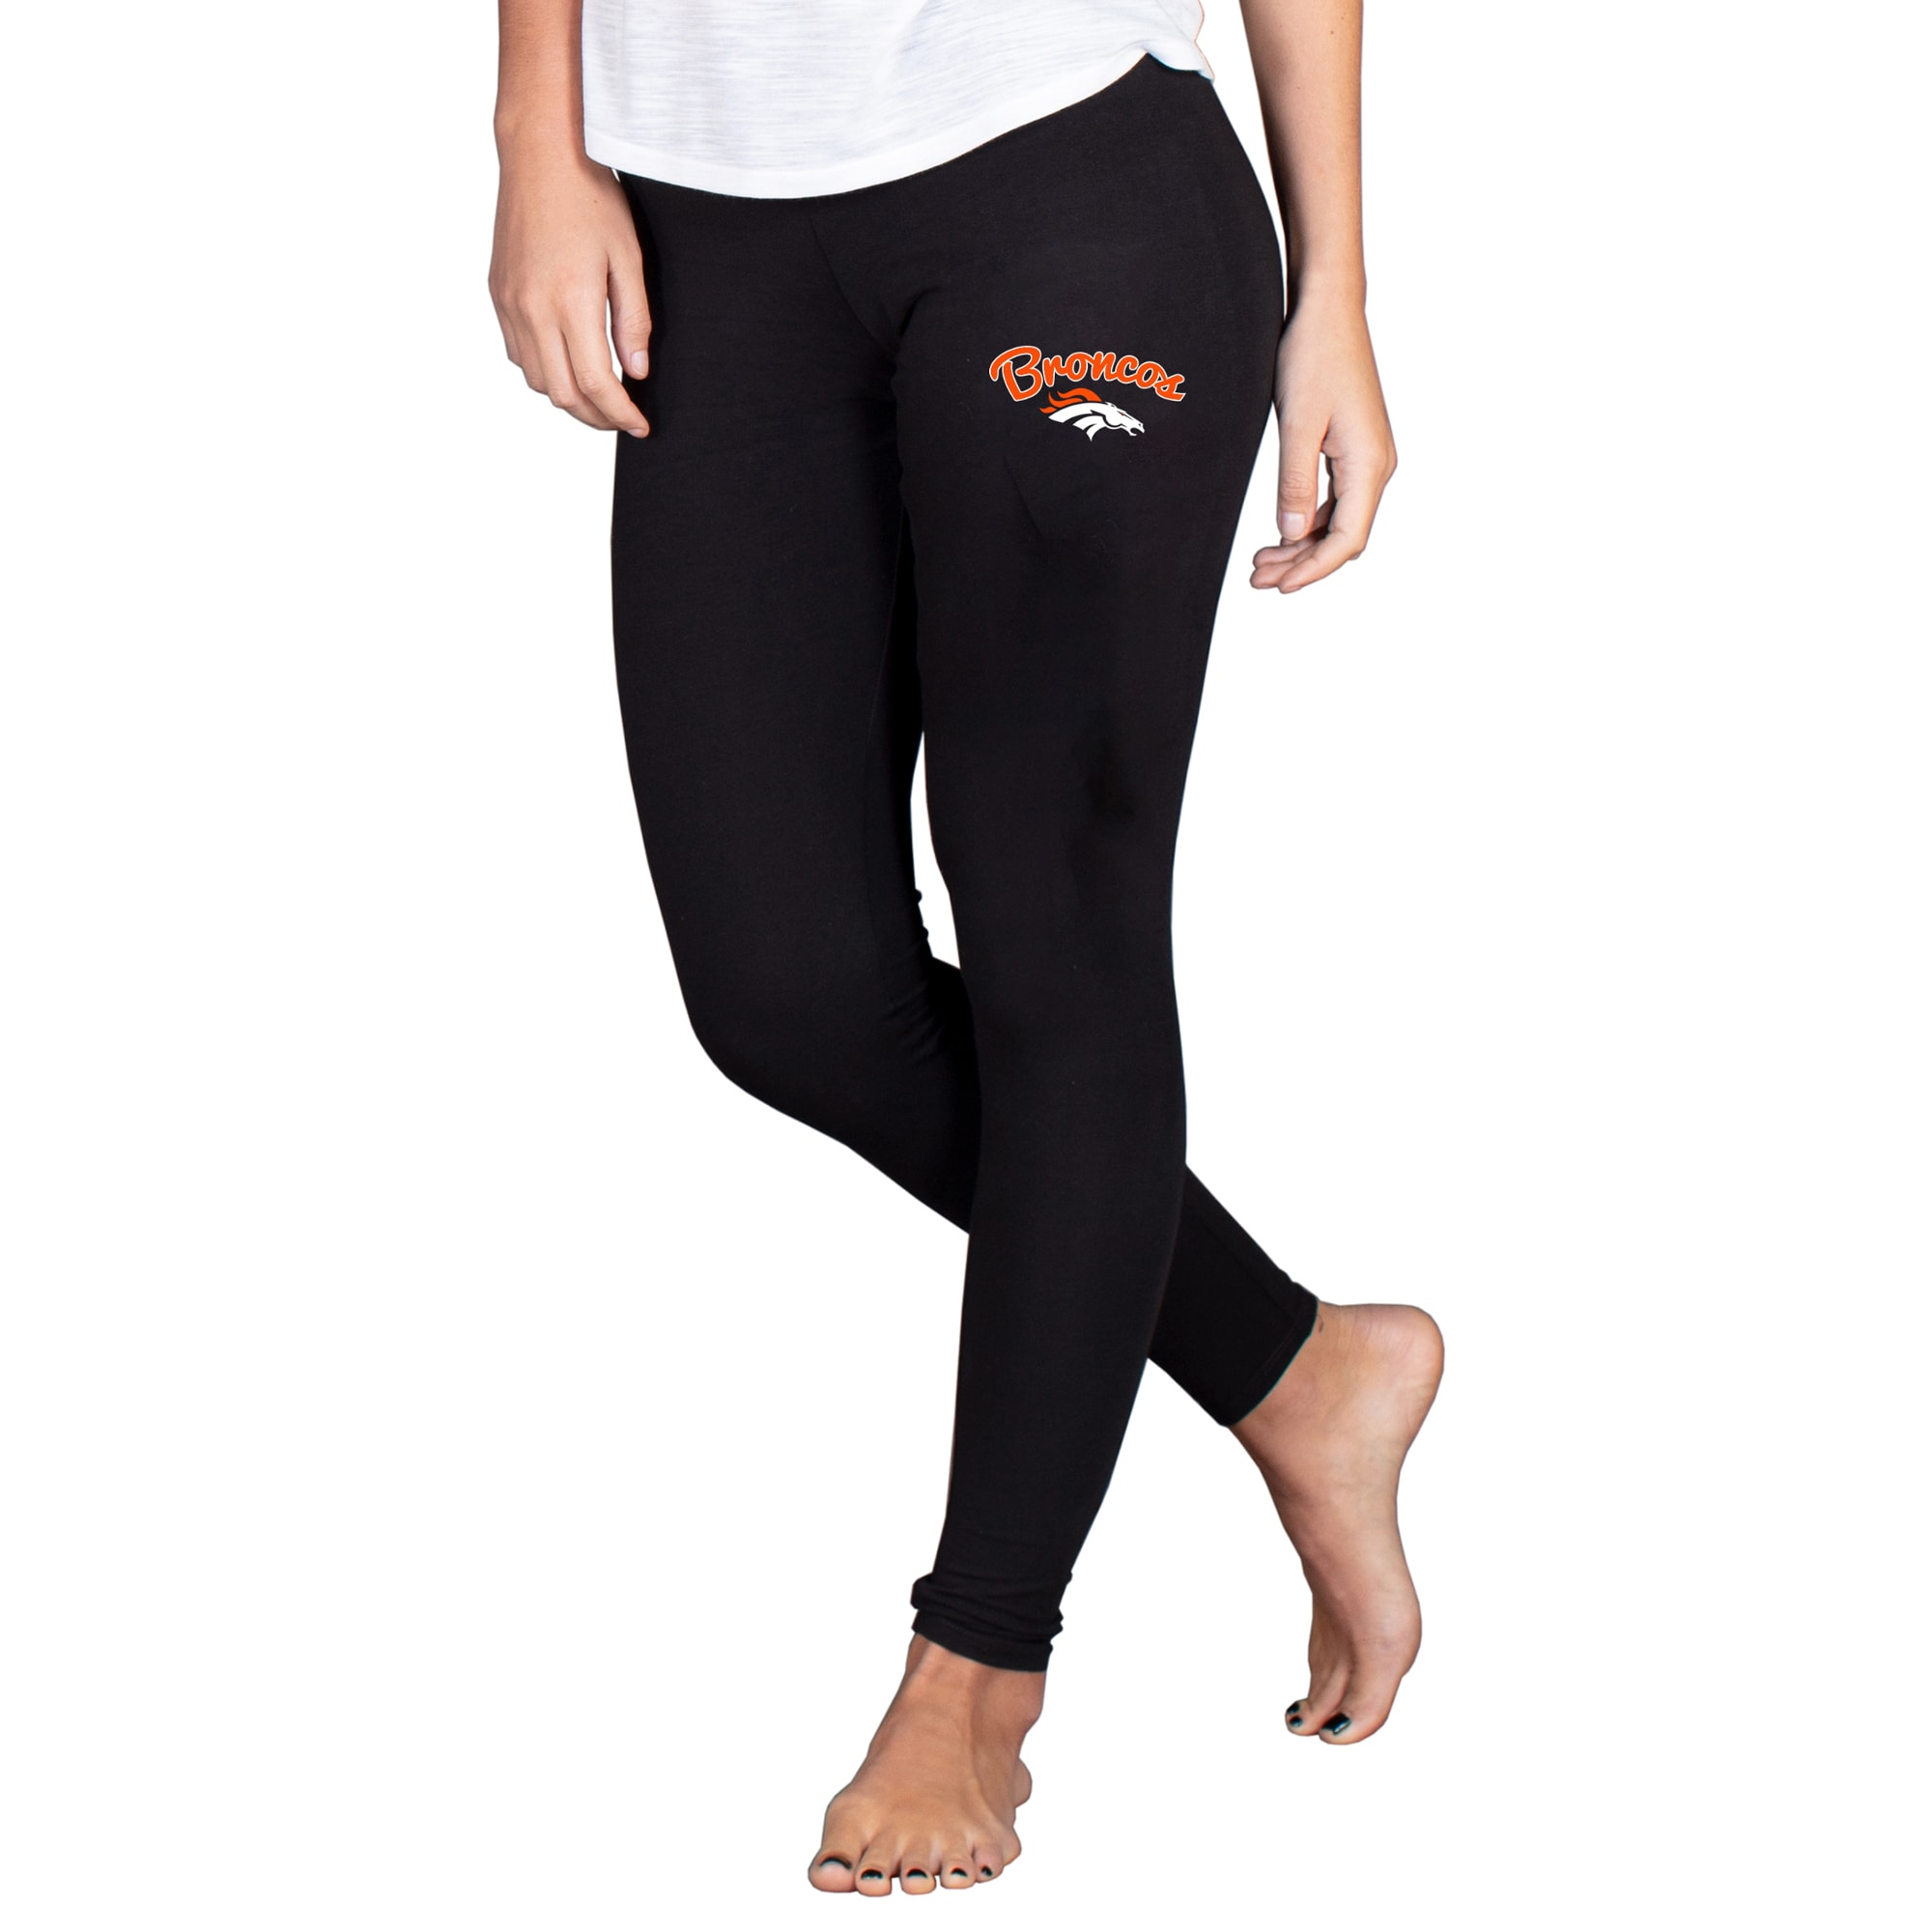 Denver Broncos Concepts Sport Women's Fraction Leggings - Black